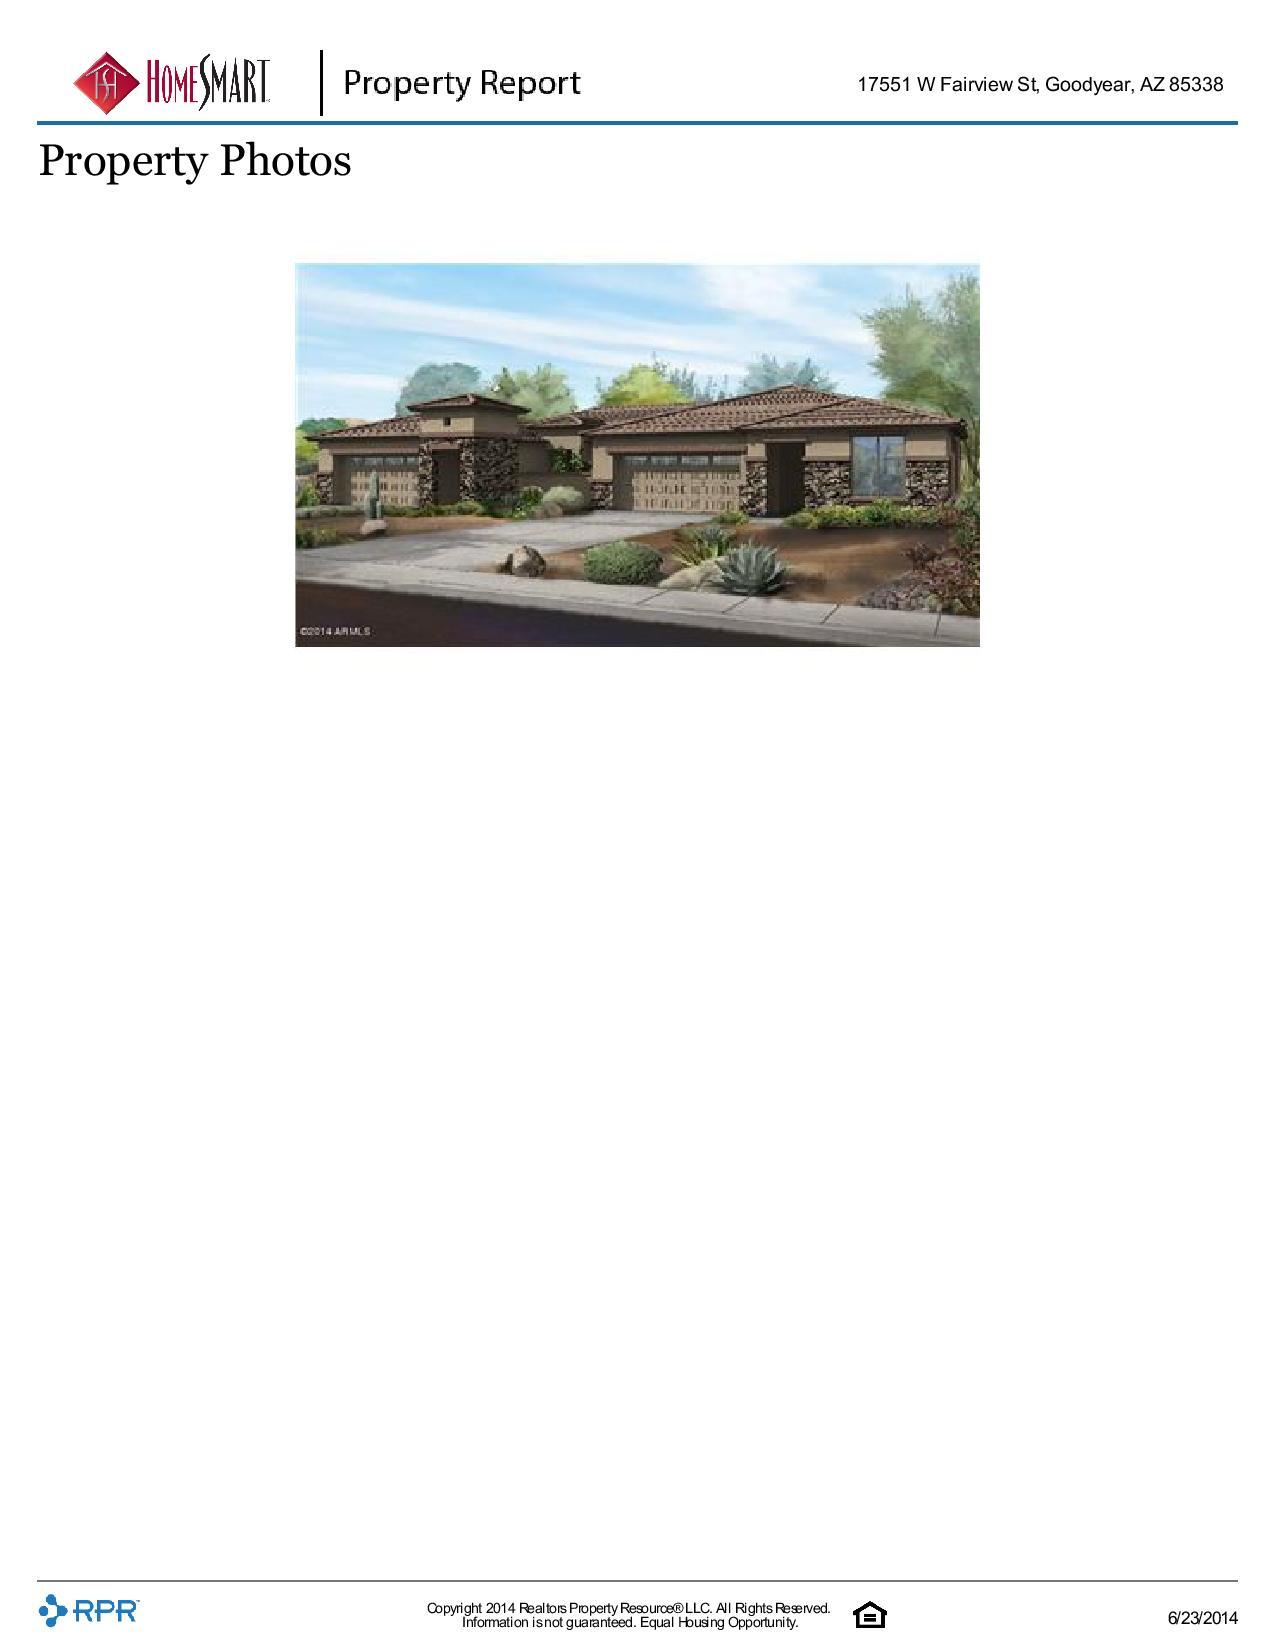 17551-W-Fairview-St-Goodyear-AZ-85338-page-005